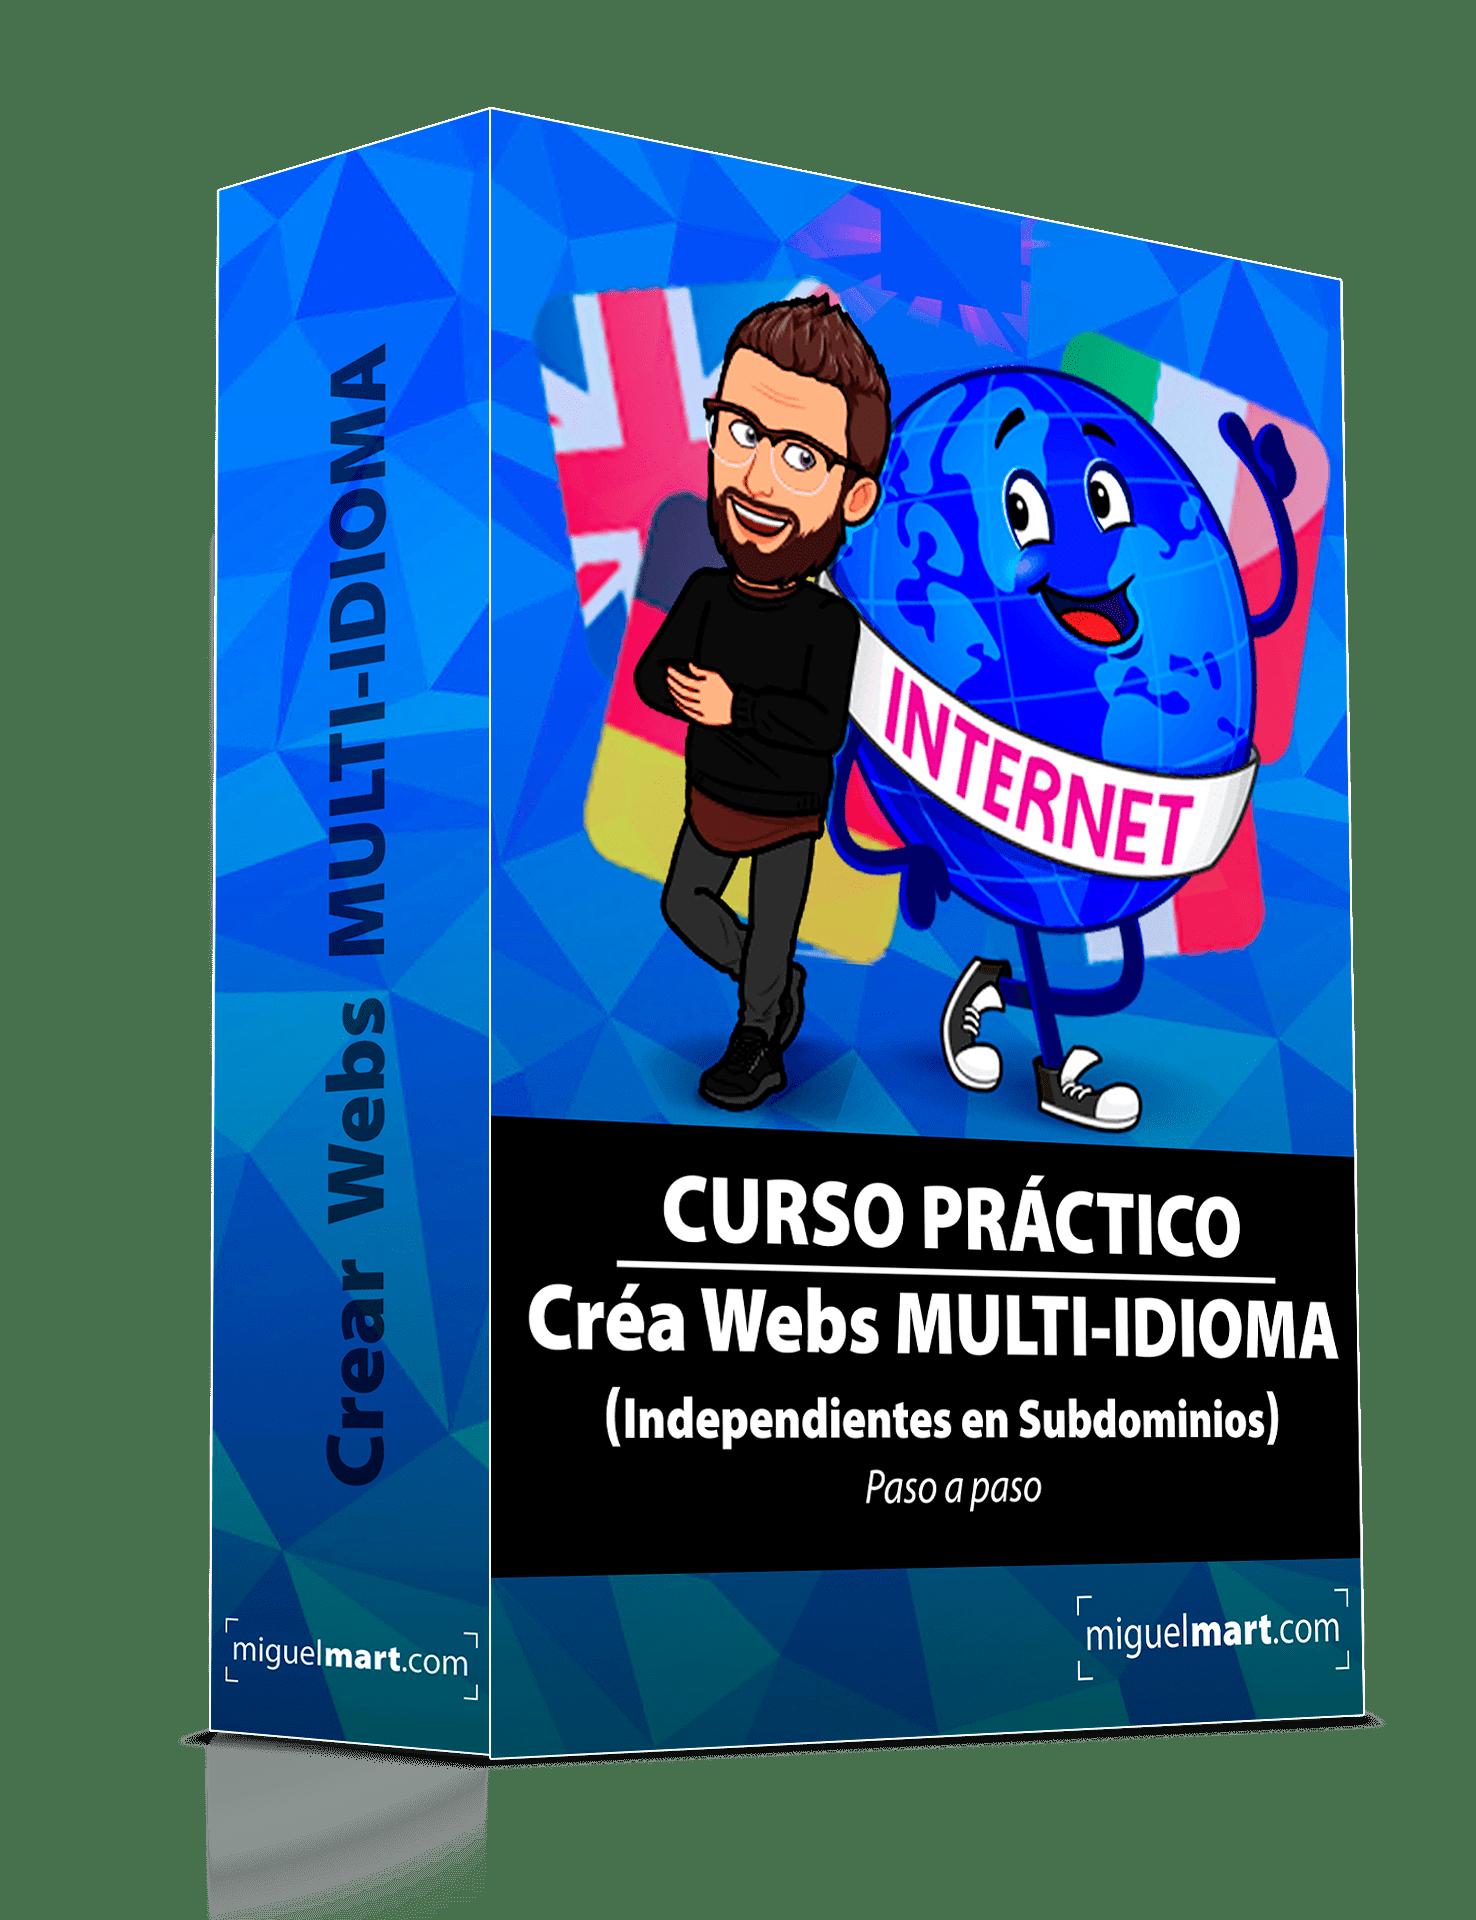 Crea Webs MULTI-IDIOMA INDEPENDIENTES